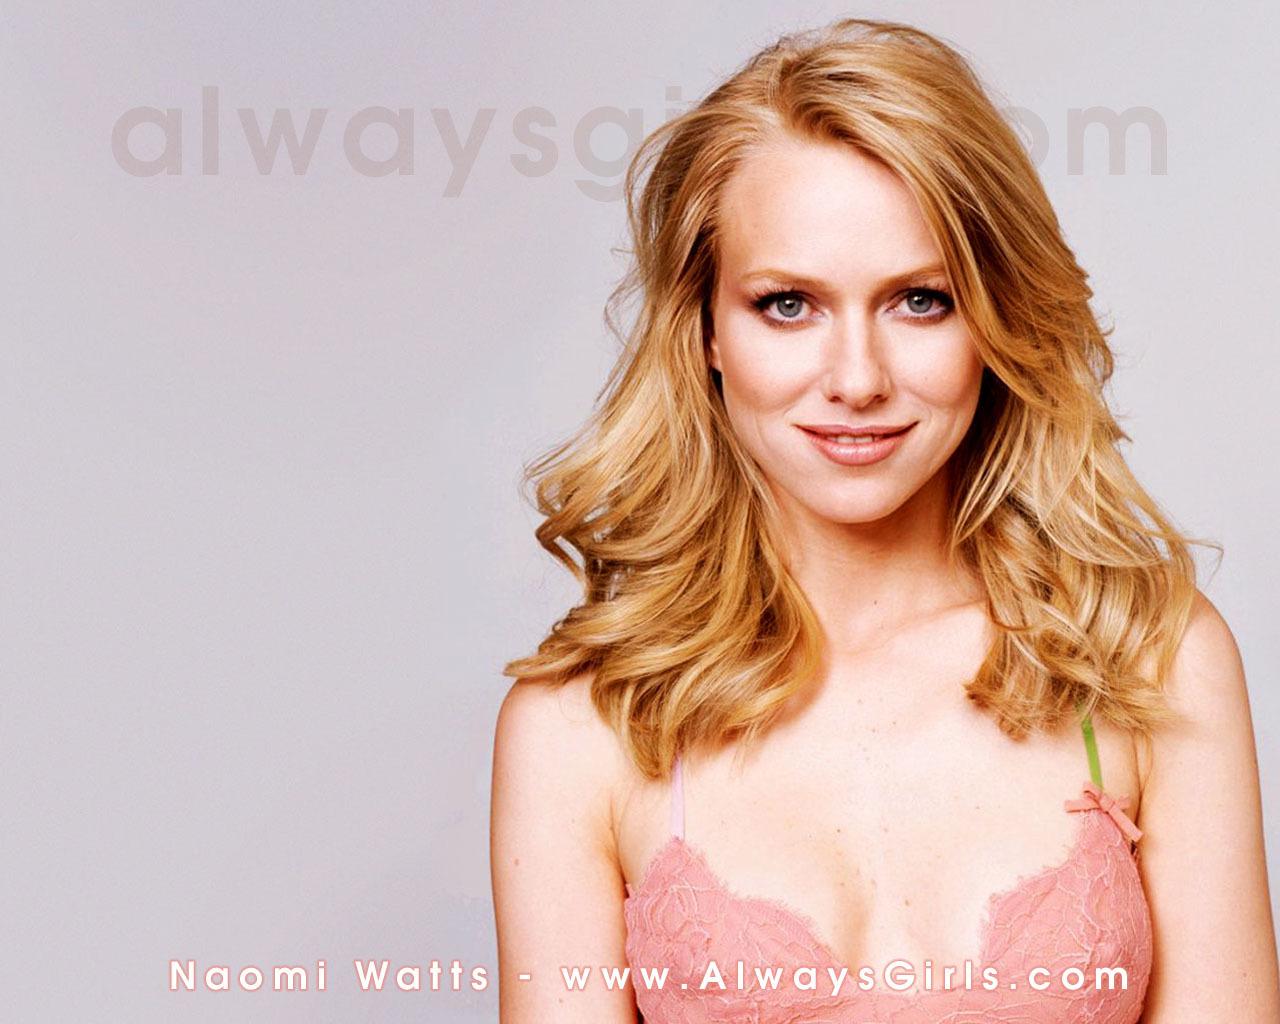 Naomi Watts   Nicole Kidman and Naomi Watts   Aussie BFFs Wallpaper 1280x1024